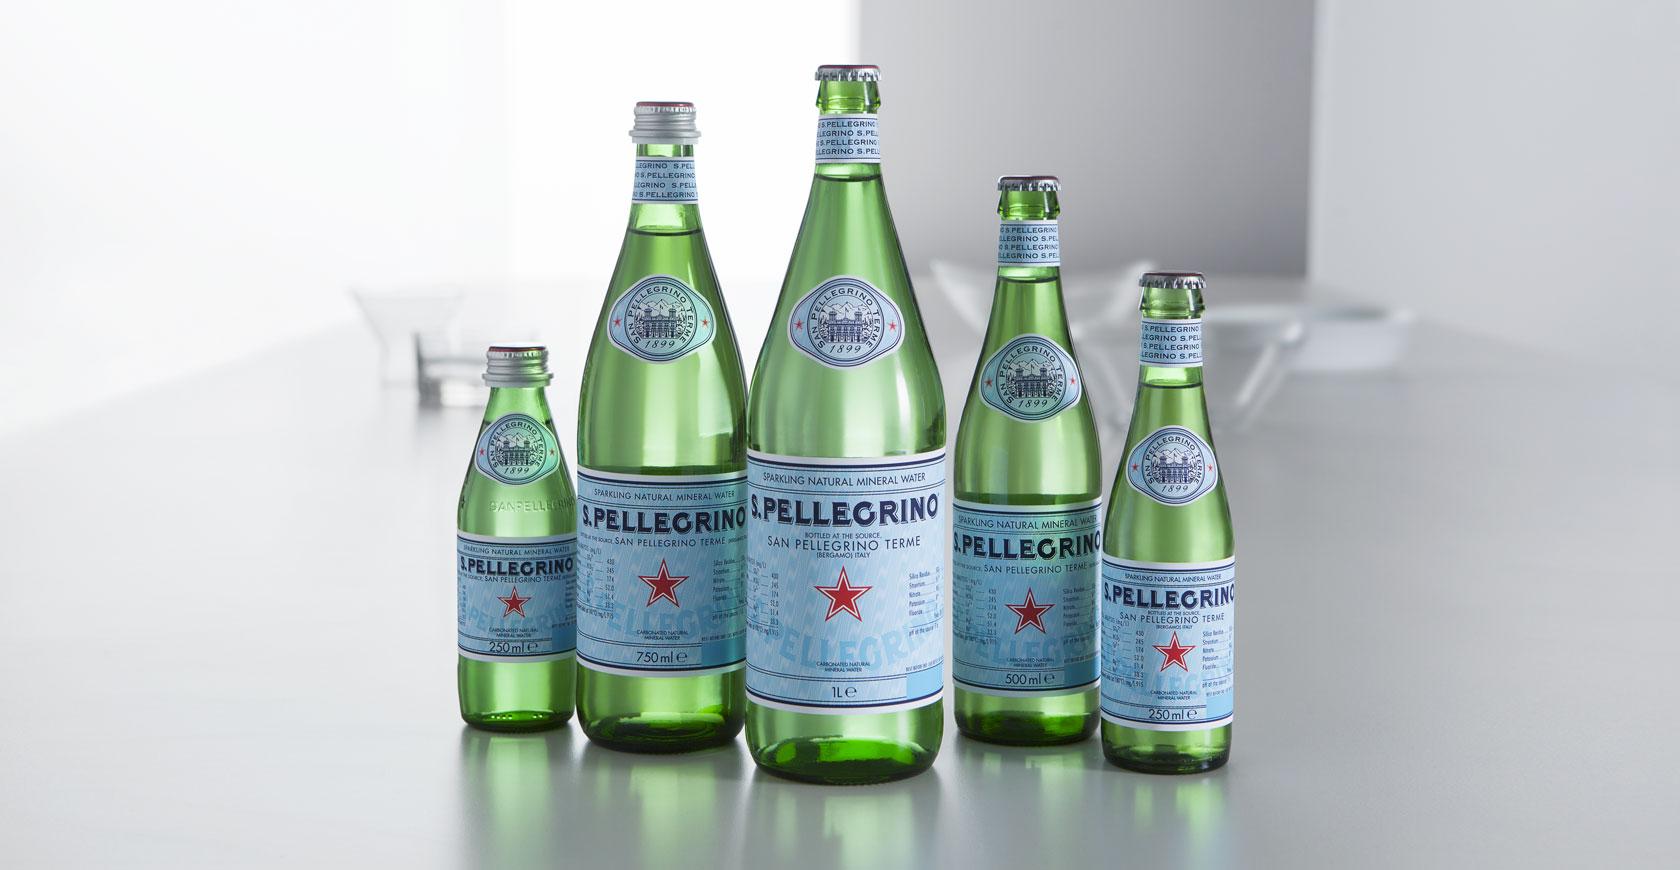 bottle Water, drinking water,mineral water,evian water,San Pellegrino water